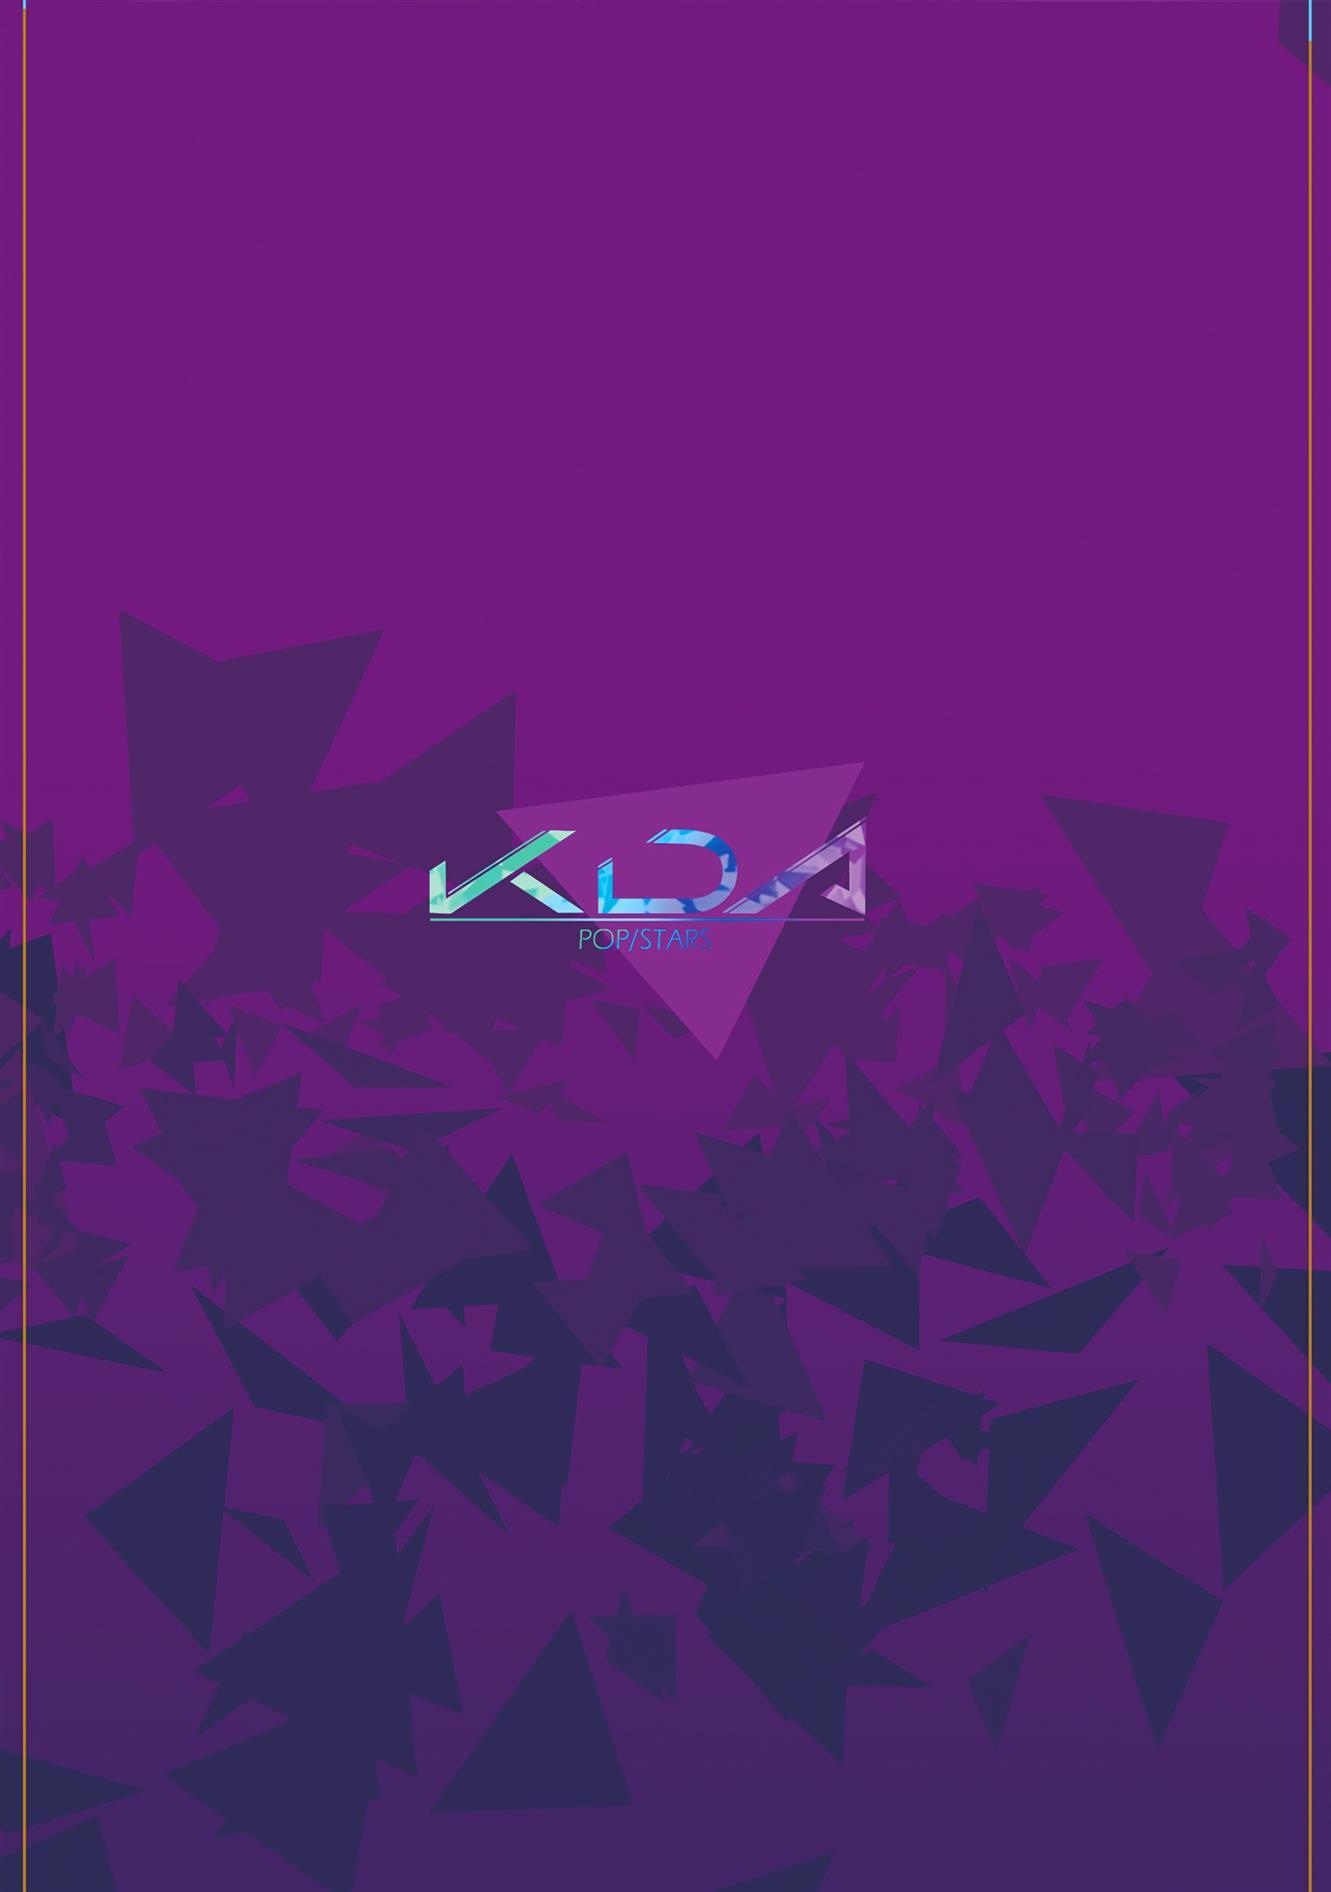 KDA A&E (League of Legends) - Foto 15